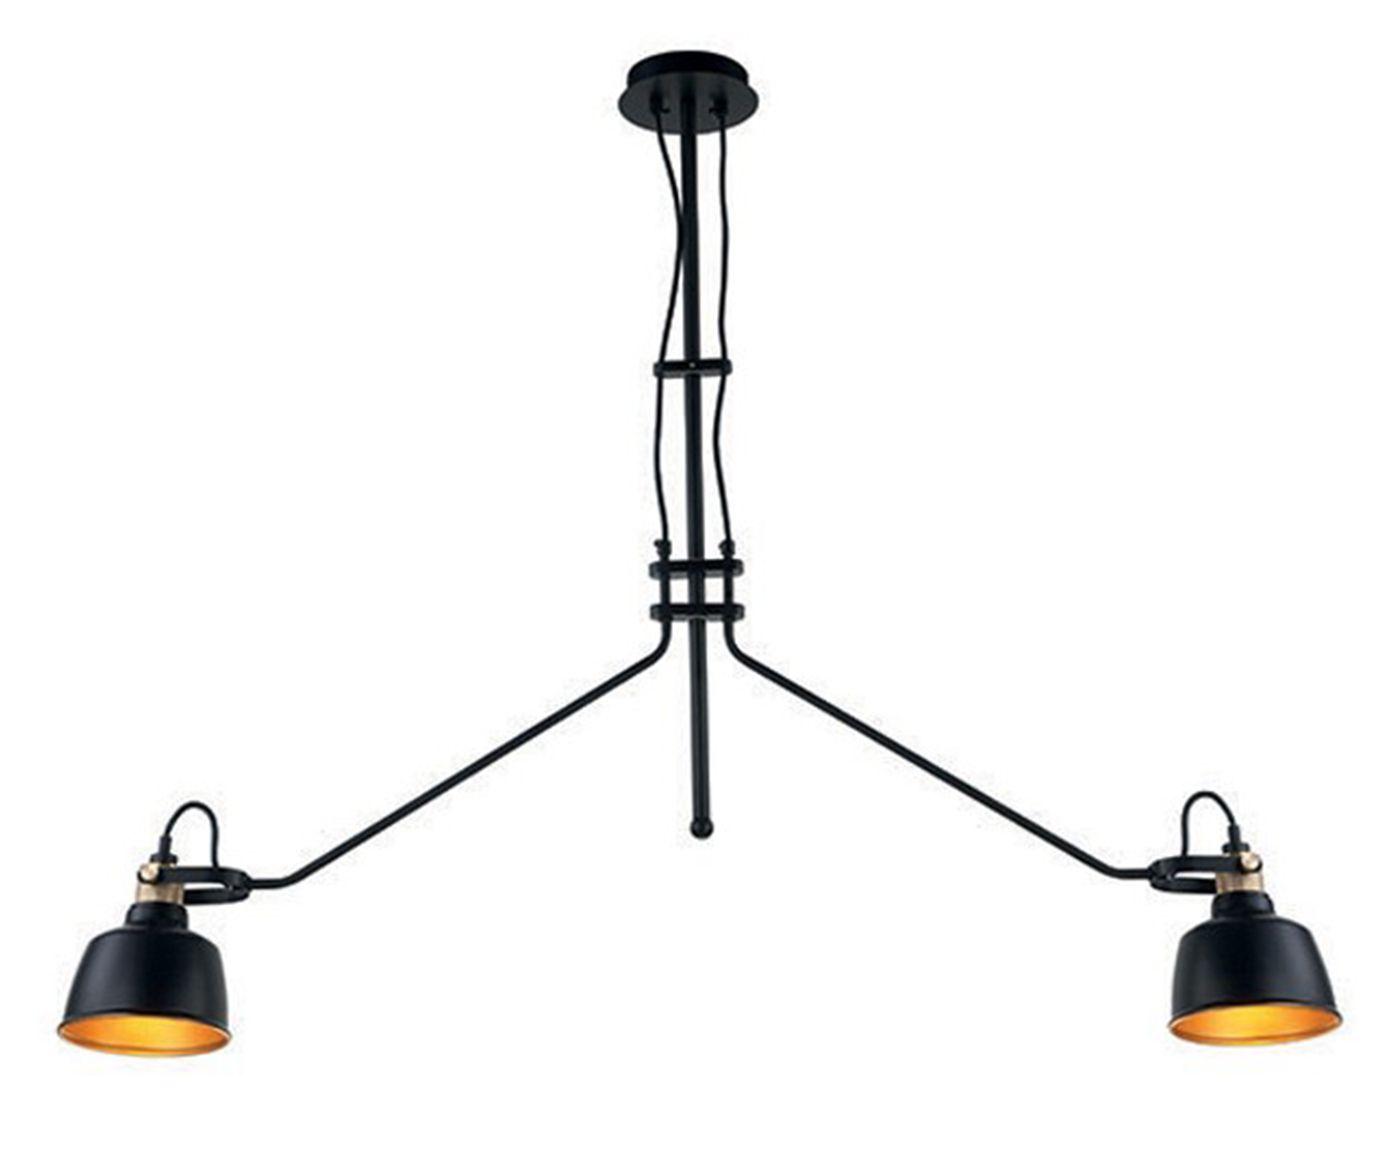 Pendente Haidee Bivolt - 16X116X115cm | Westwing.com.br